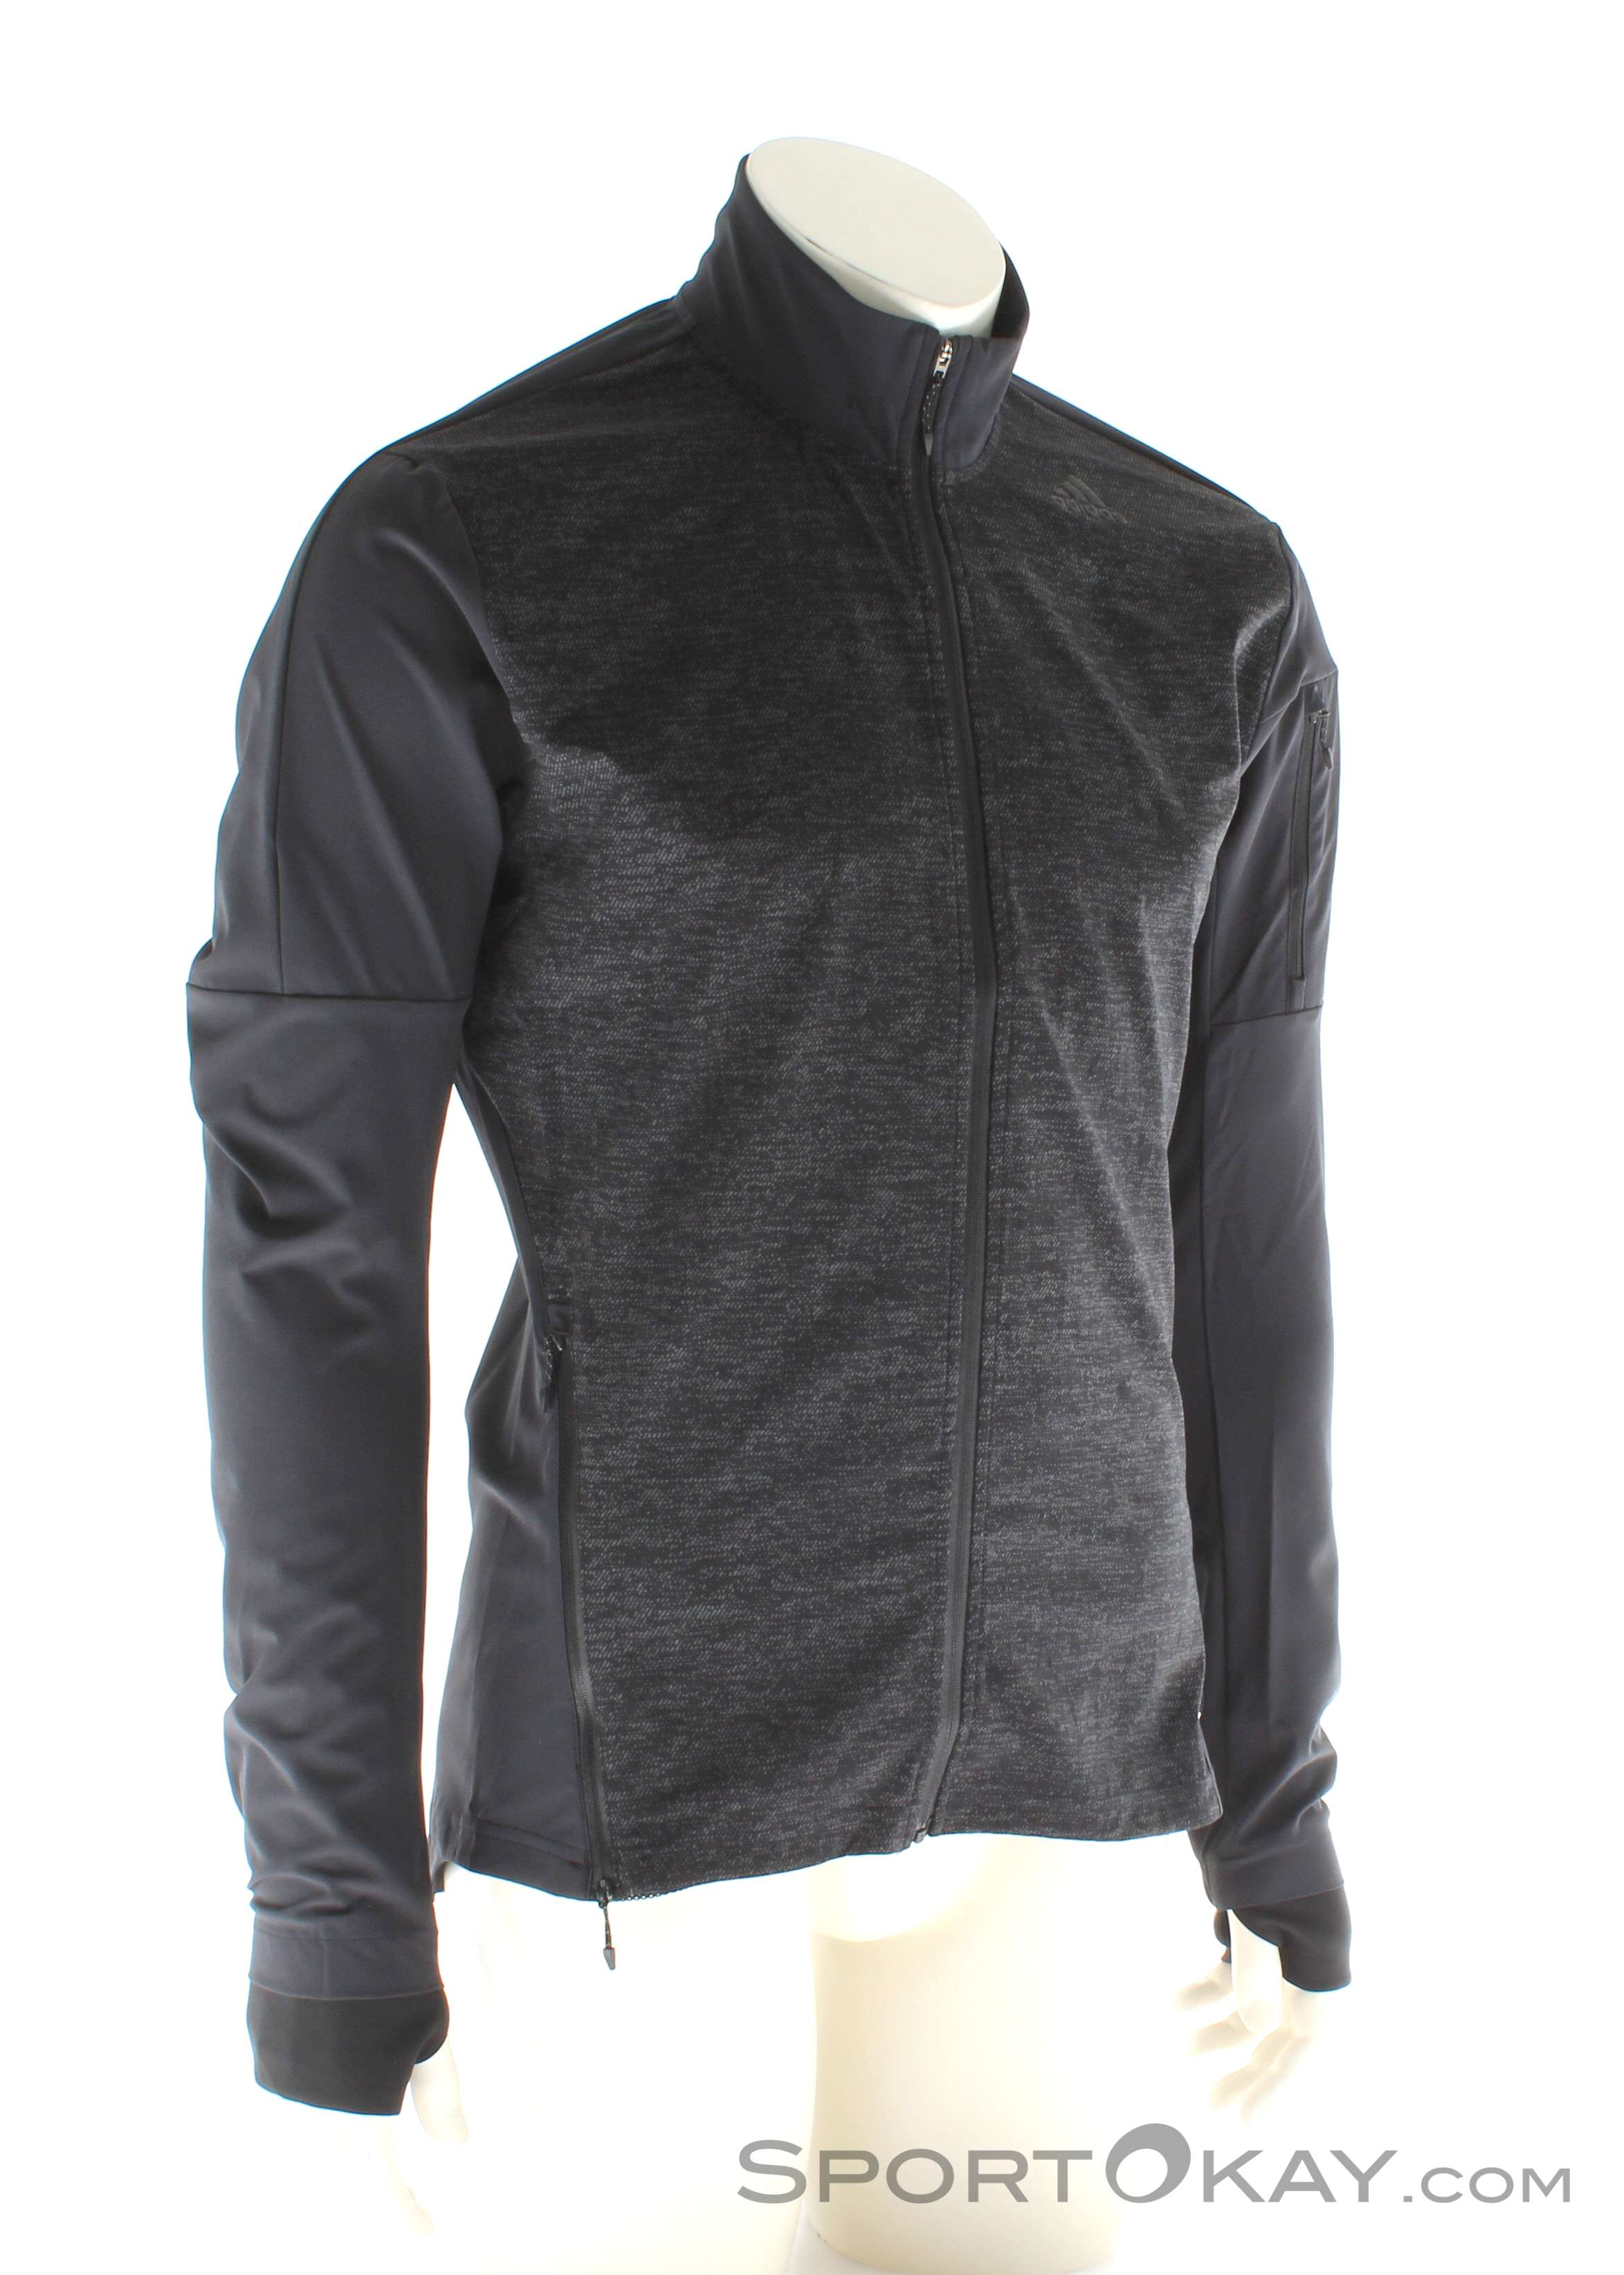 69ce7f34d402 adidas Supernova Storm Jacket Mens Running Jacket, adidas, Black, , Male,  0002